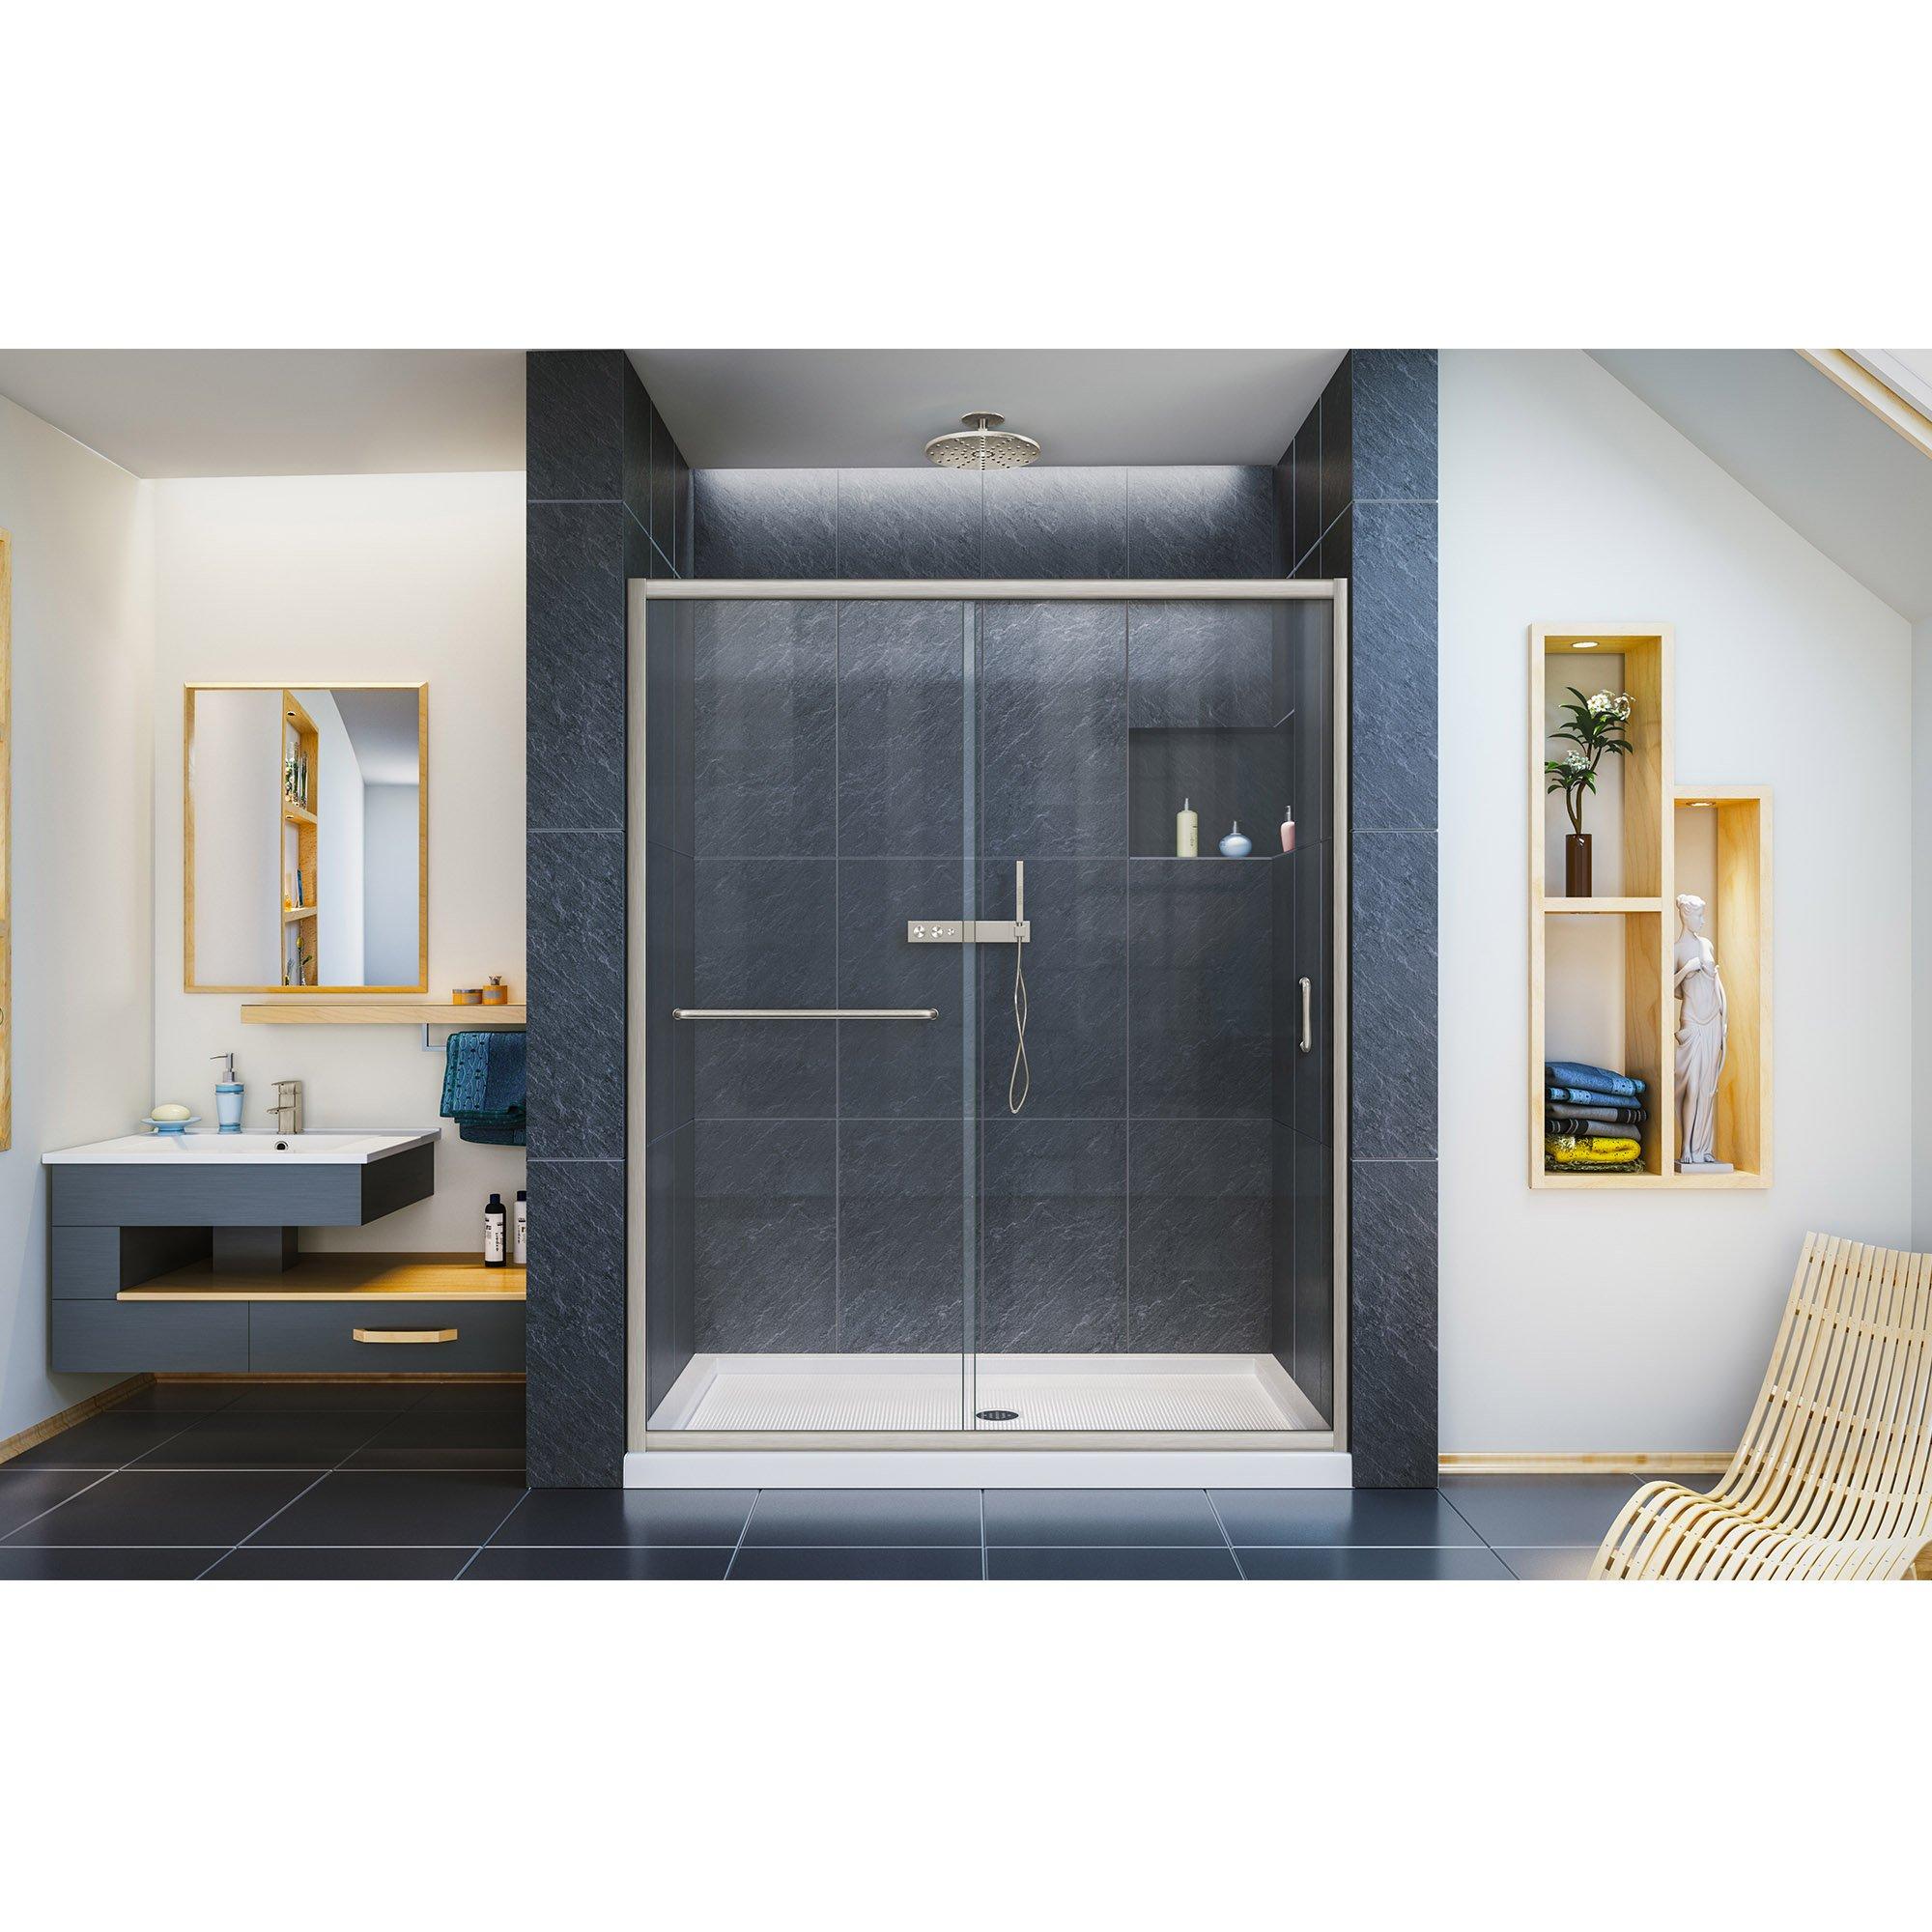 DreamLine Infinity-Z 50-54 in. W x 72 in. H Semi-Frameless Sliding Shower Door, Clear Glass in Brushed Nickel, SHDR-0954720-04 by DreamLine (Image #3)